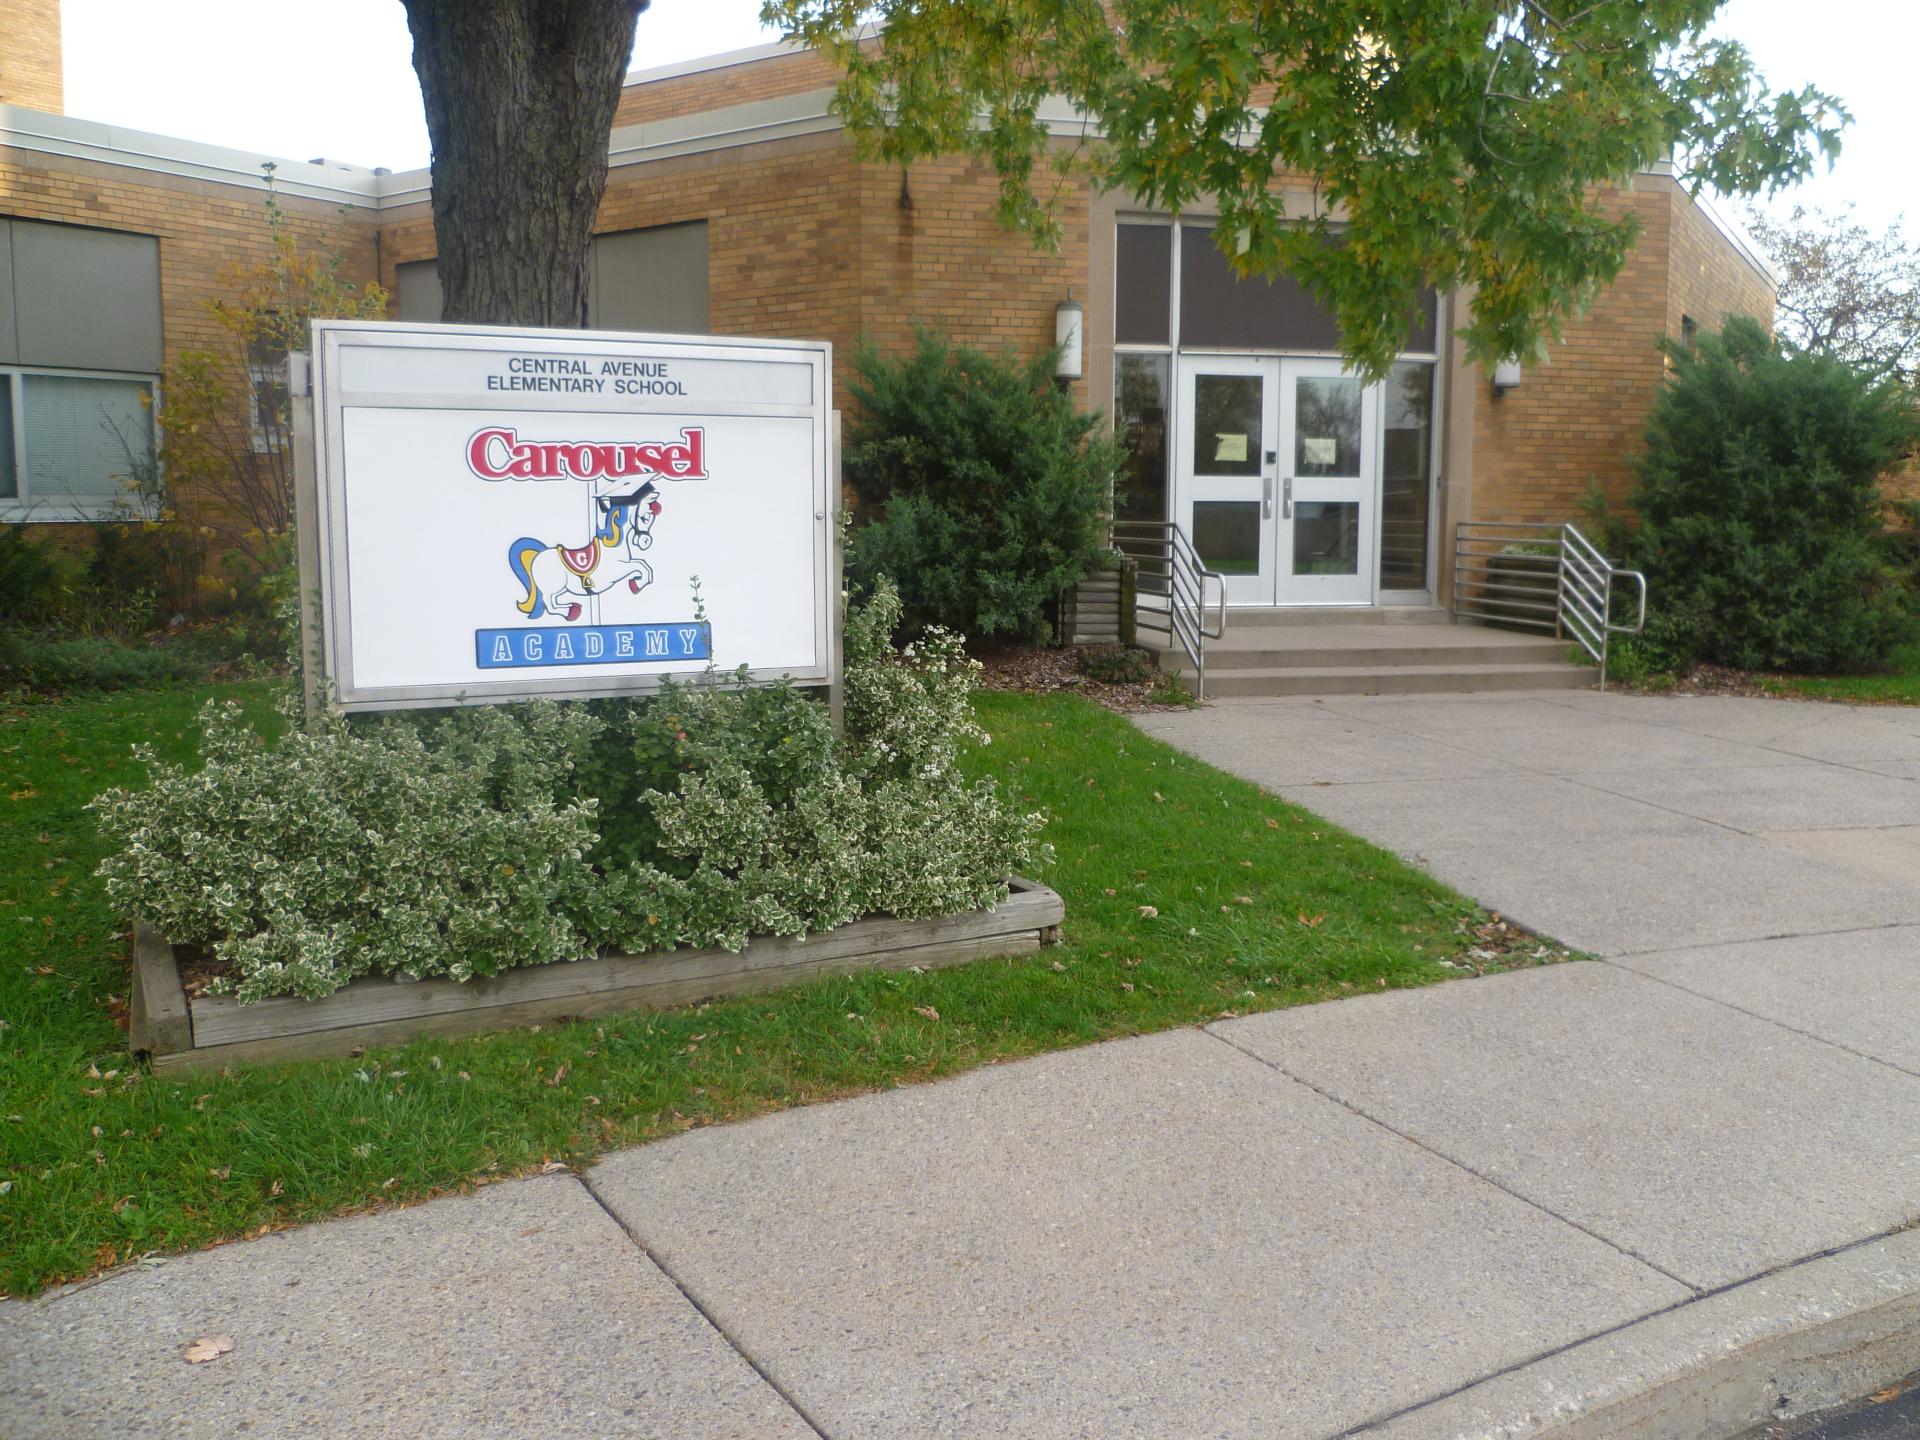 Carousel Academy: Lancaster Location